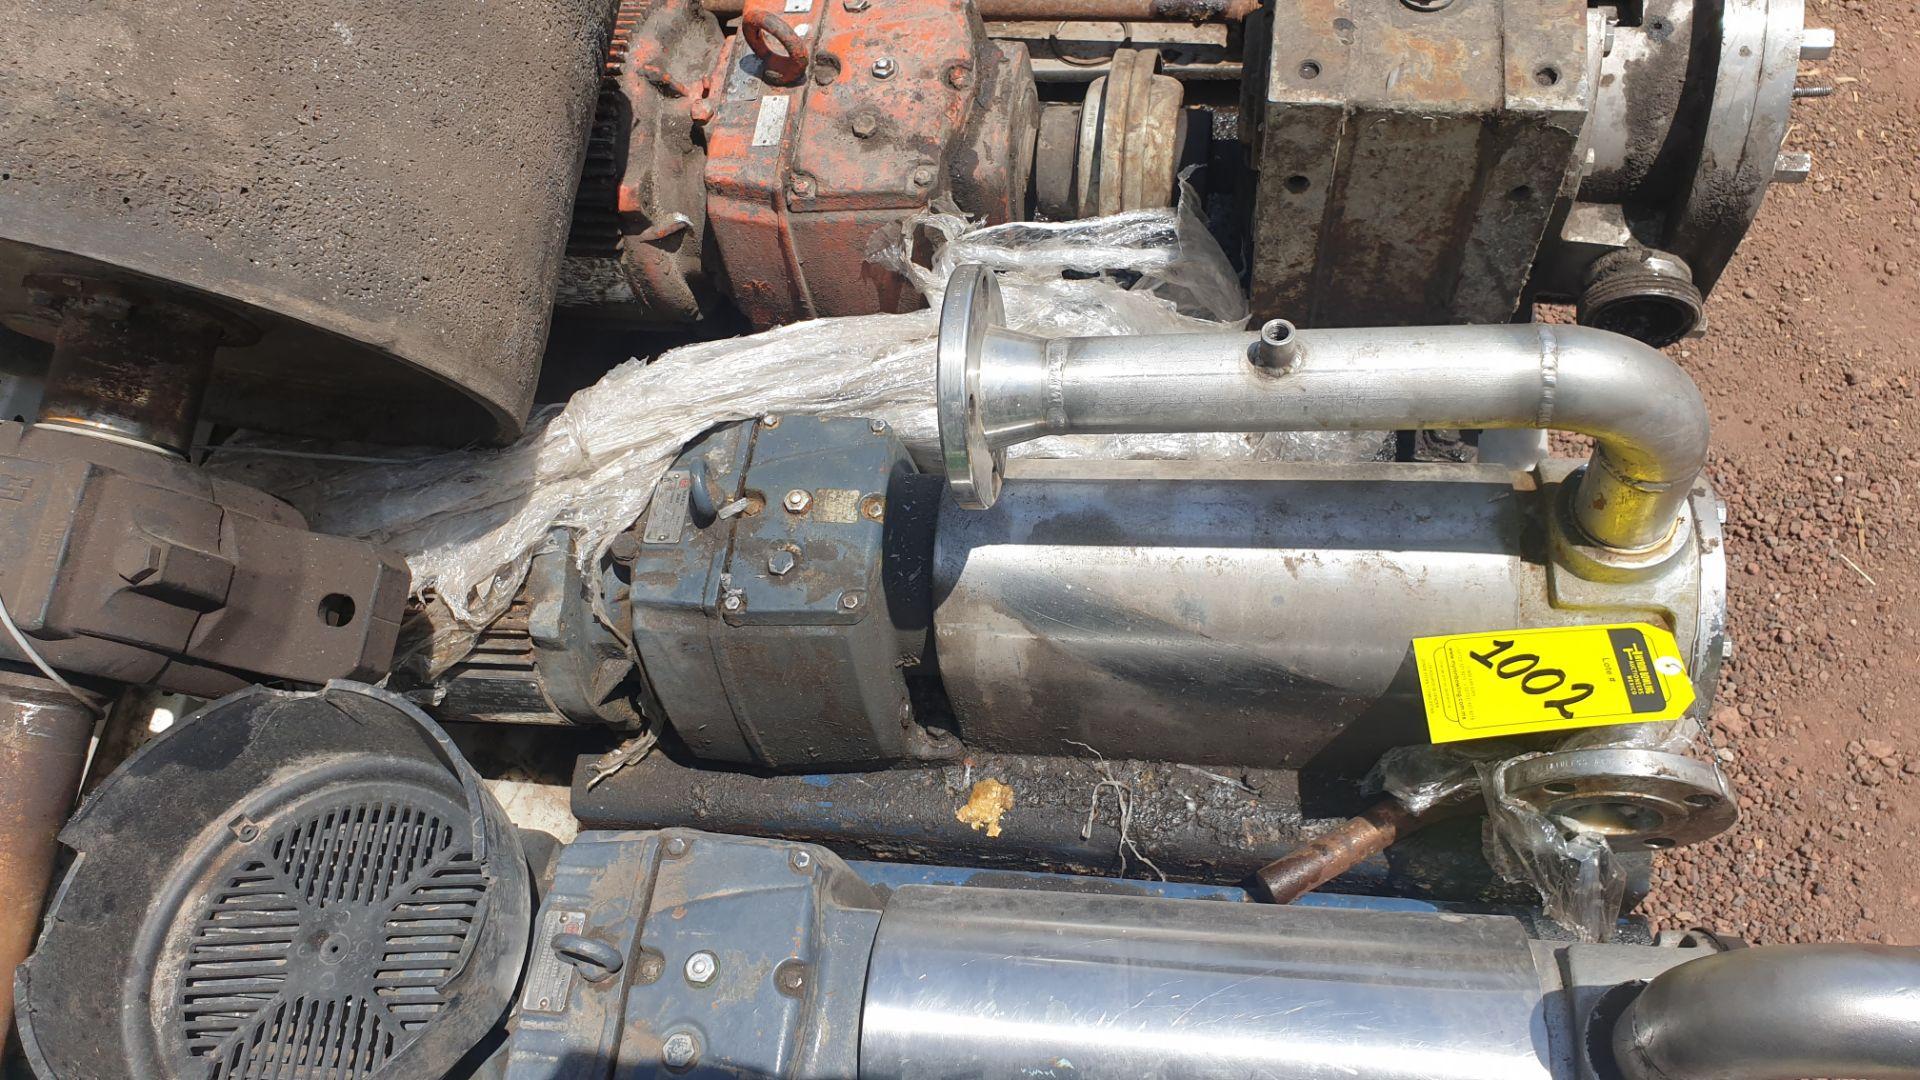 Pneumatic pump, includes emerson motor, model 684982 capacity 10Hp 230v - 460v - Image 5 of 8